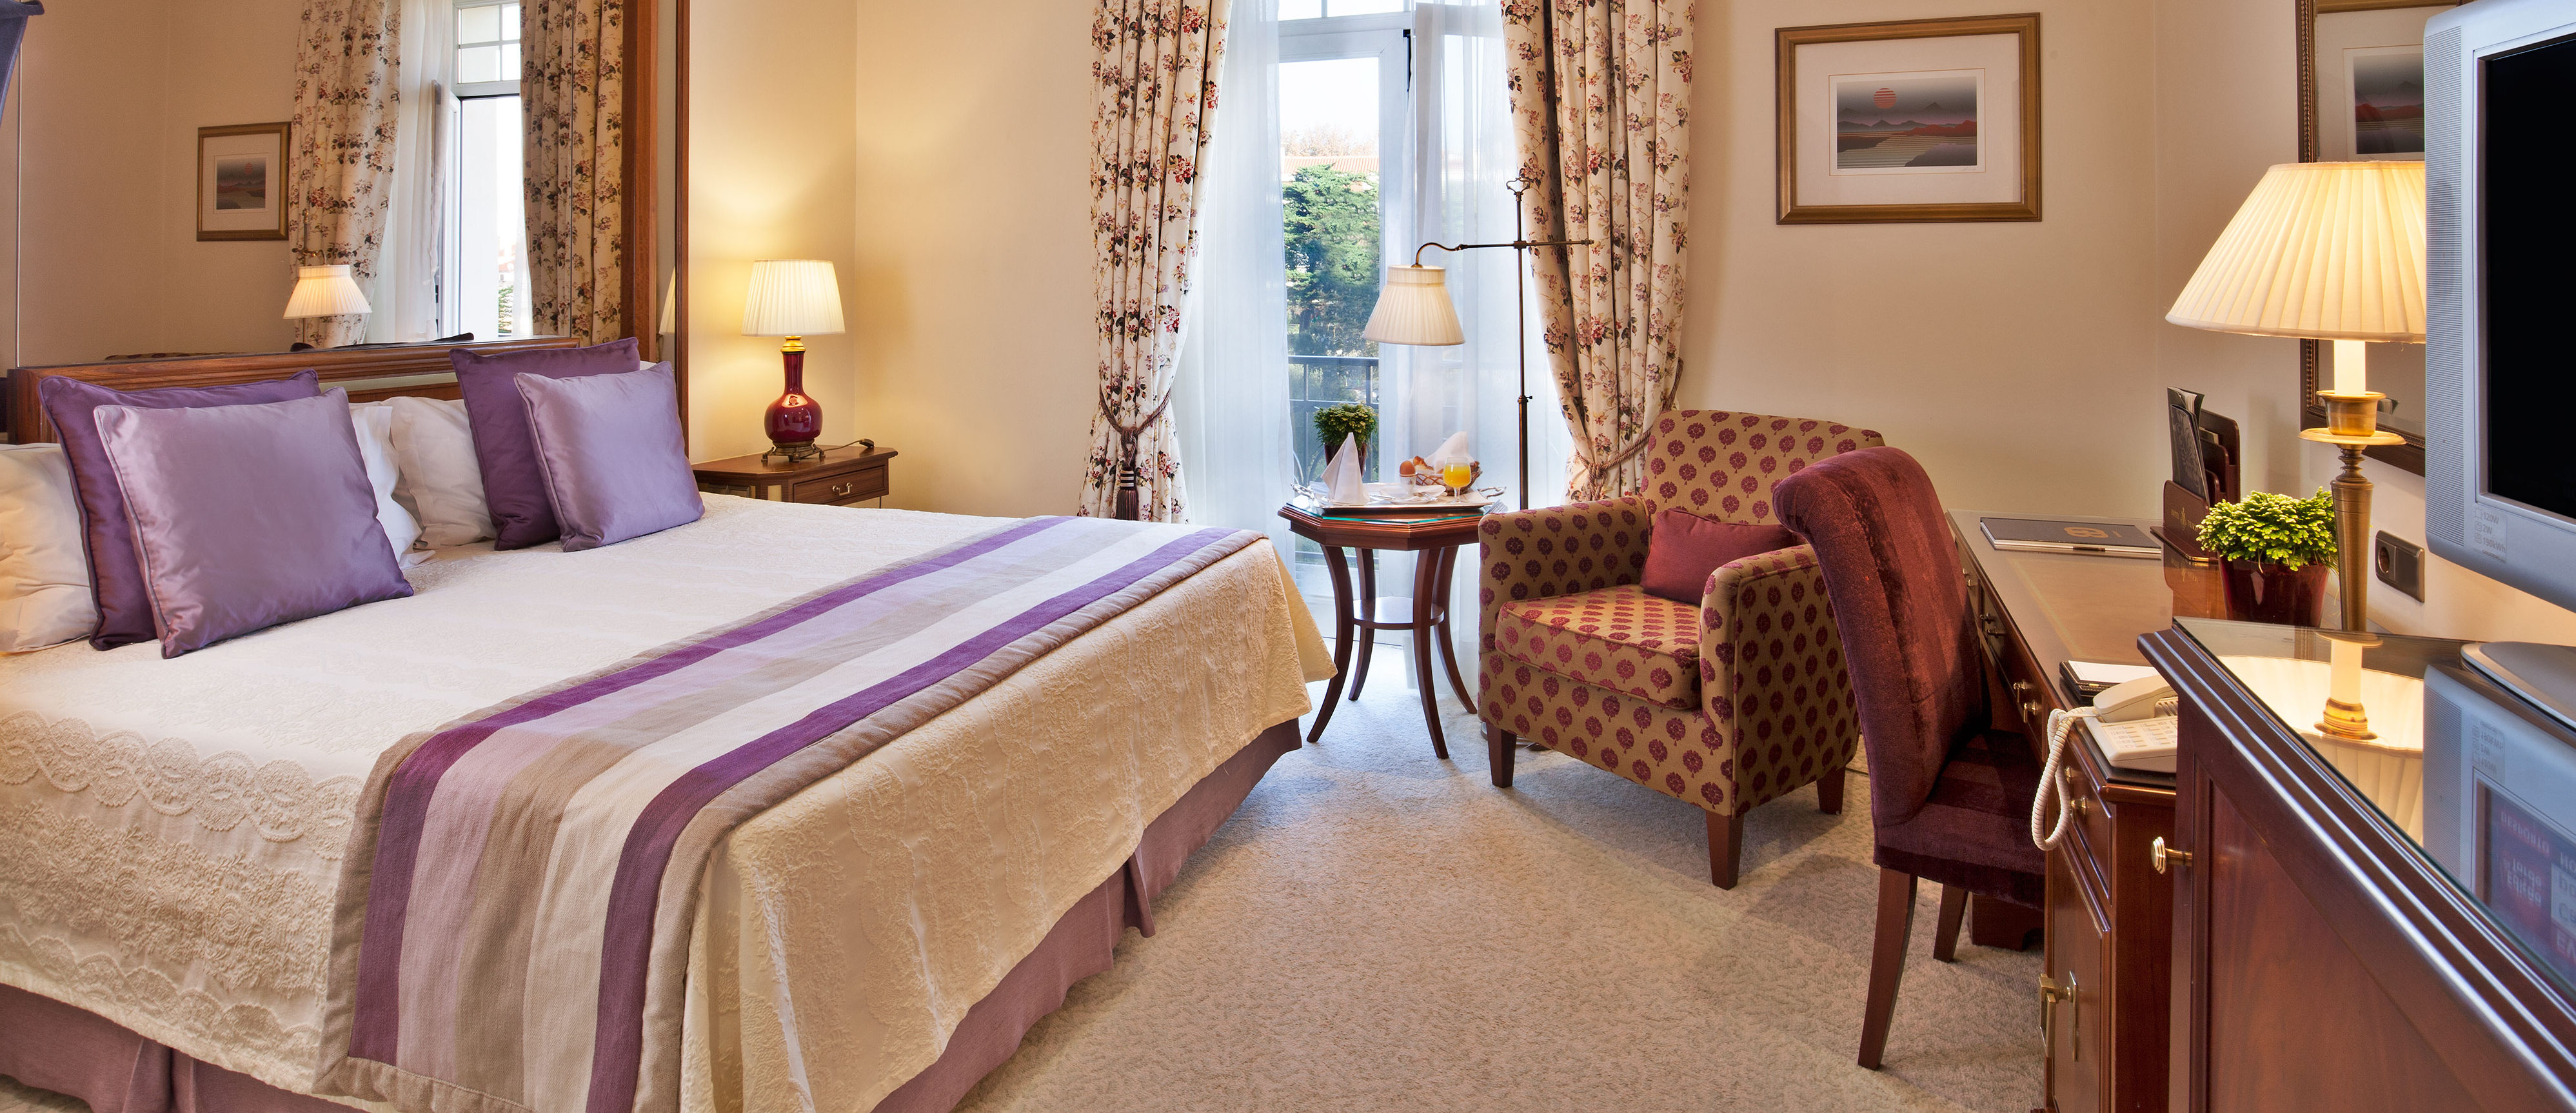 classic-room-palacio-estoril